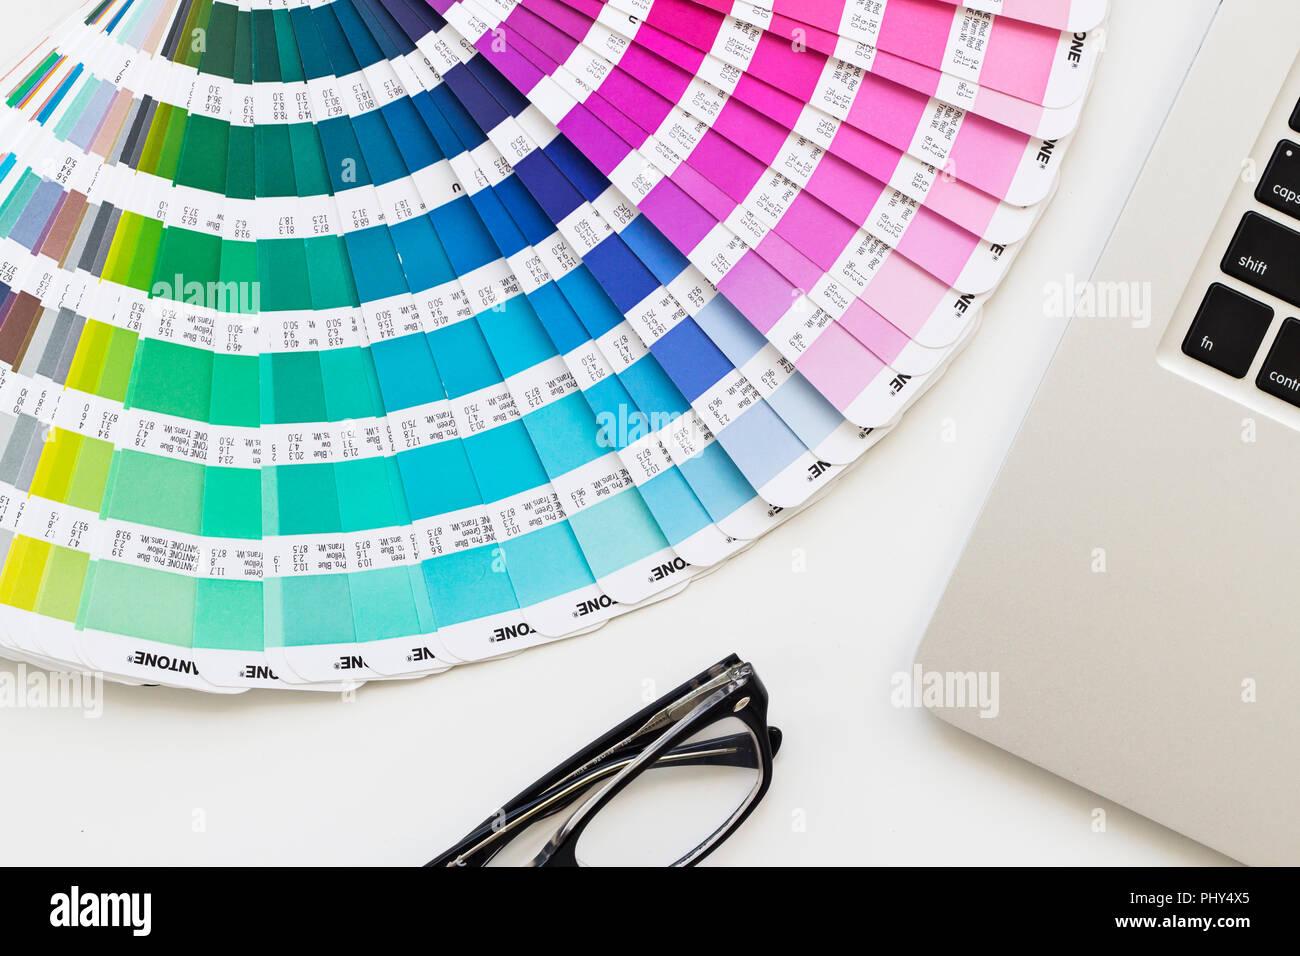 Pantone Color Stock Photos & Pantone Color Stock Images - Alamy